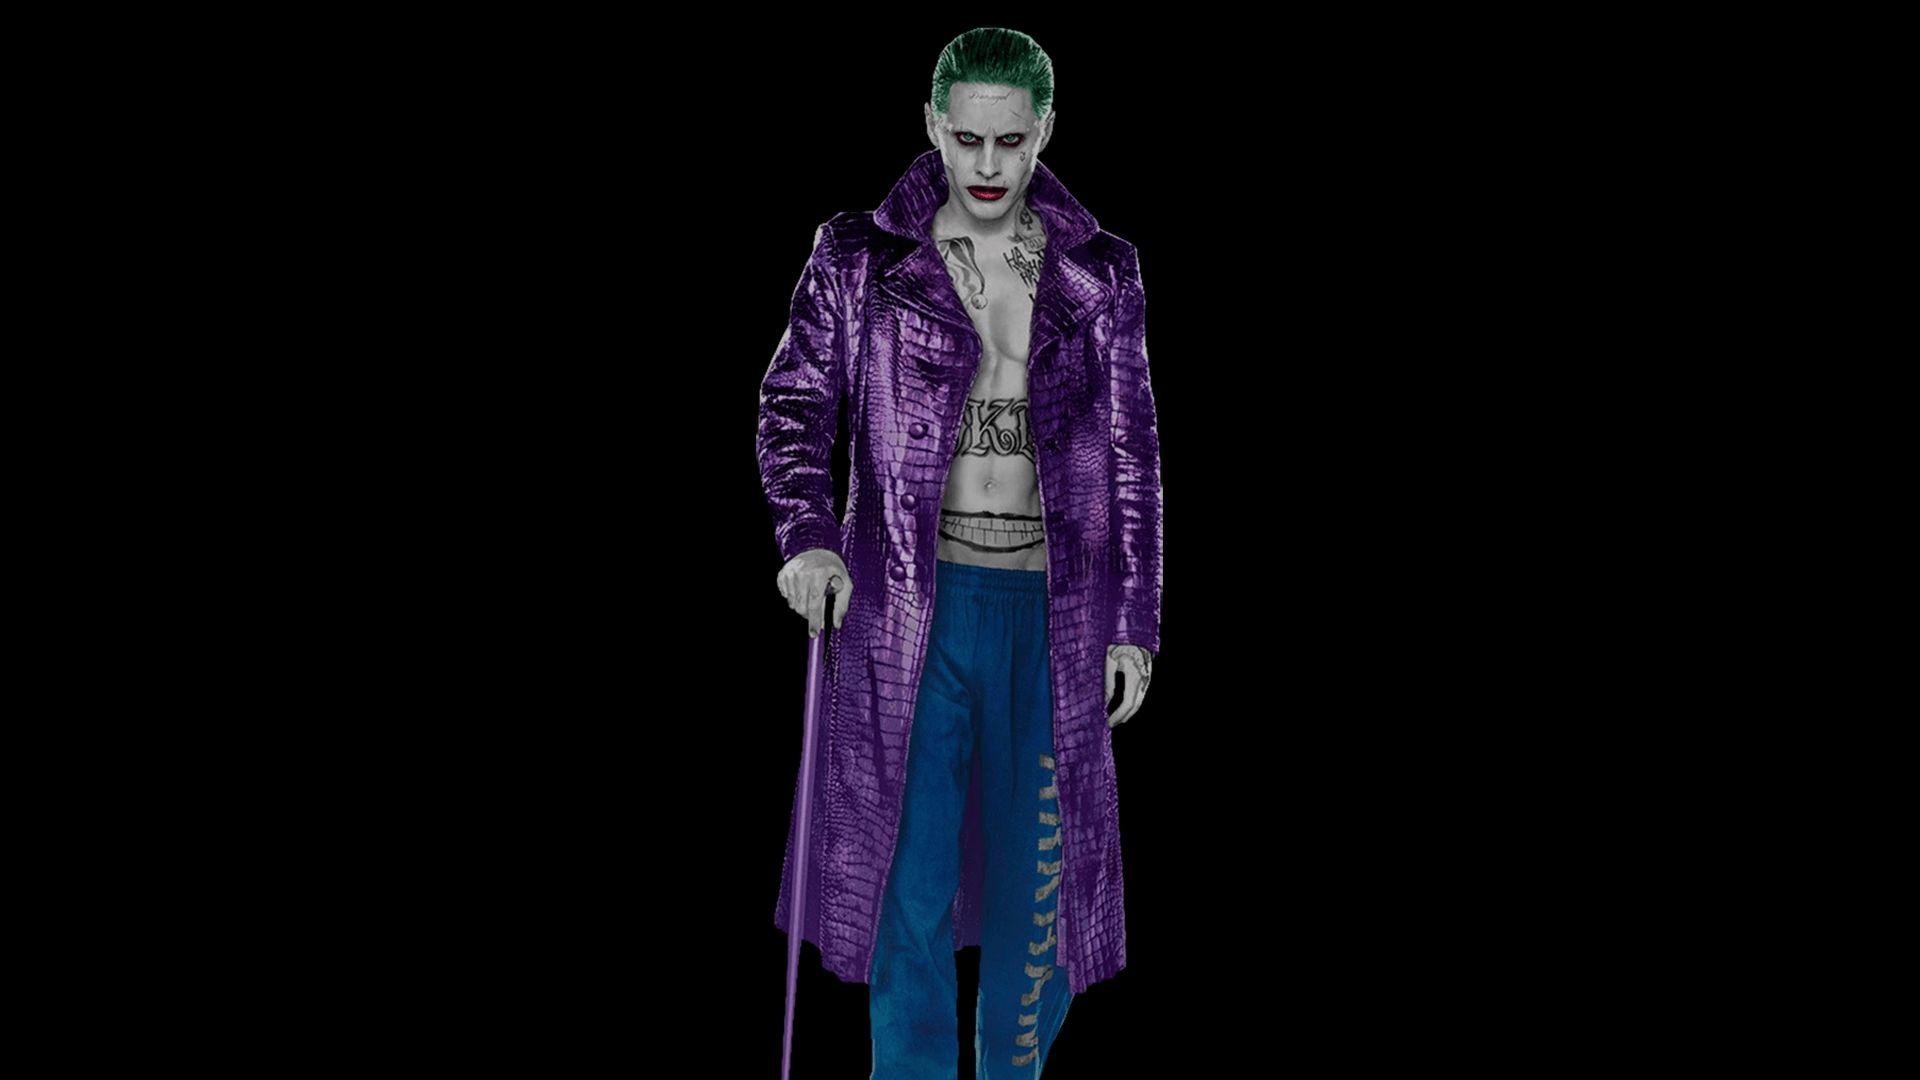 Suicide Squad, Joker Background Wallpaper